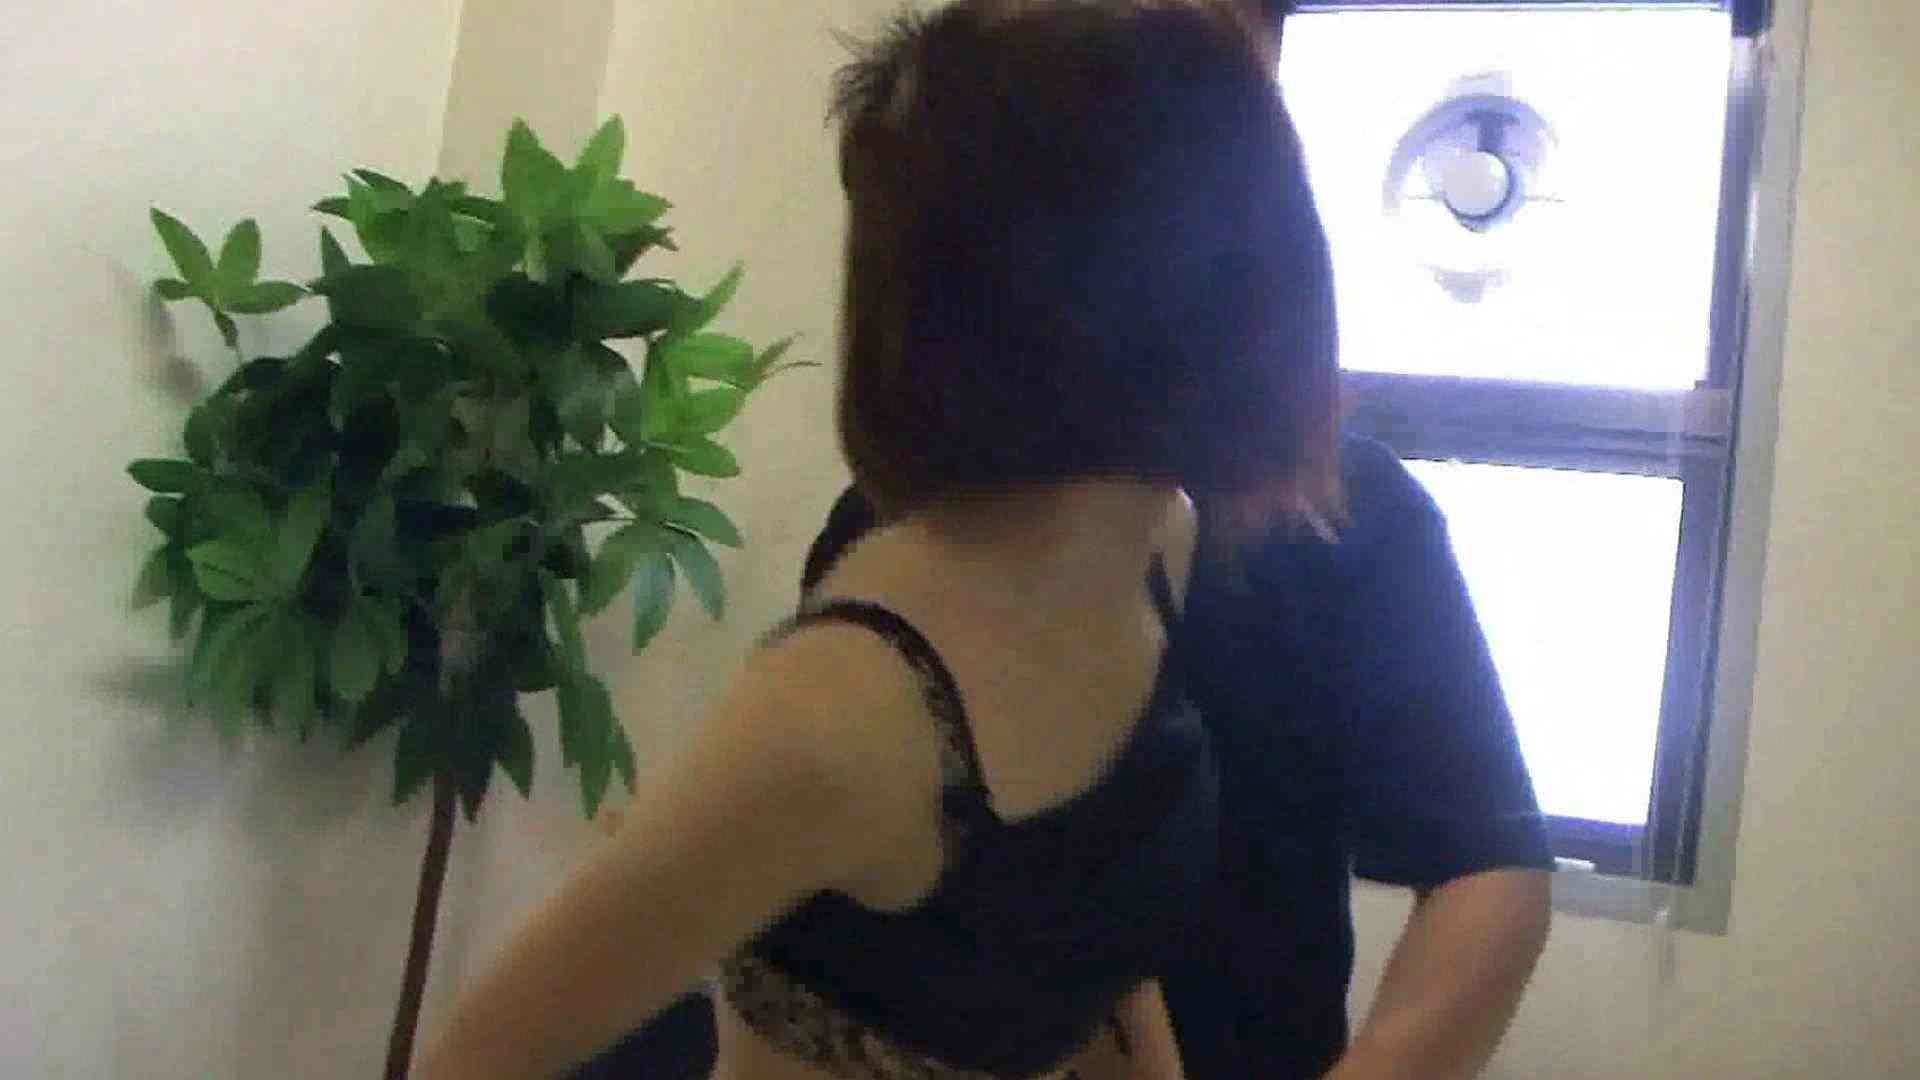 S級厳選美女ビッチガールVol.26 OLの実態 盗撮ワレメ無修正動画無料 78pic 26